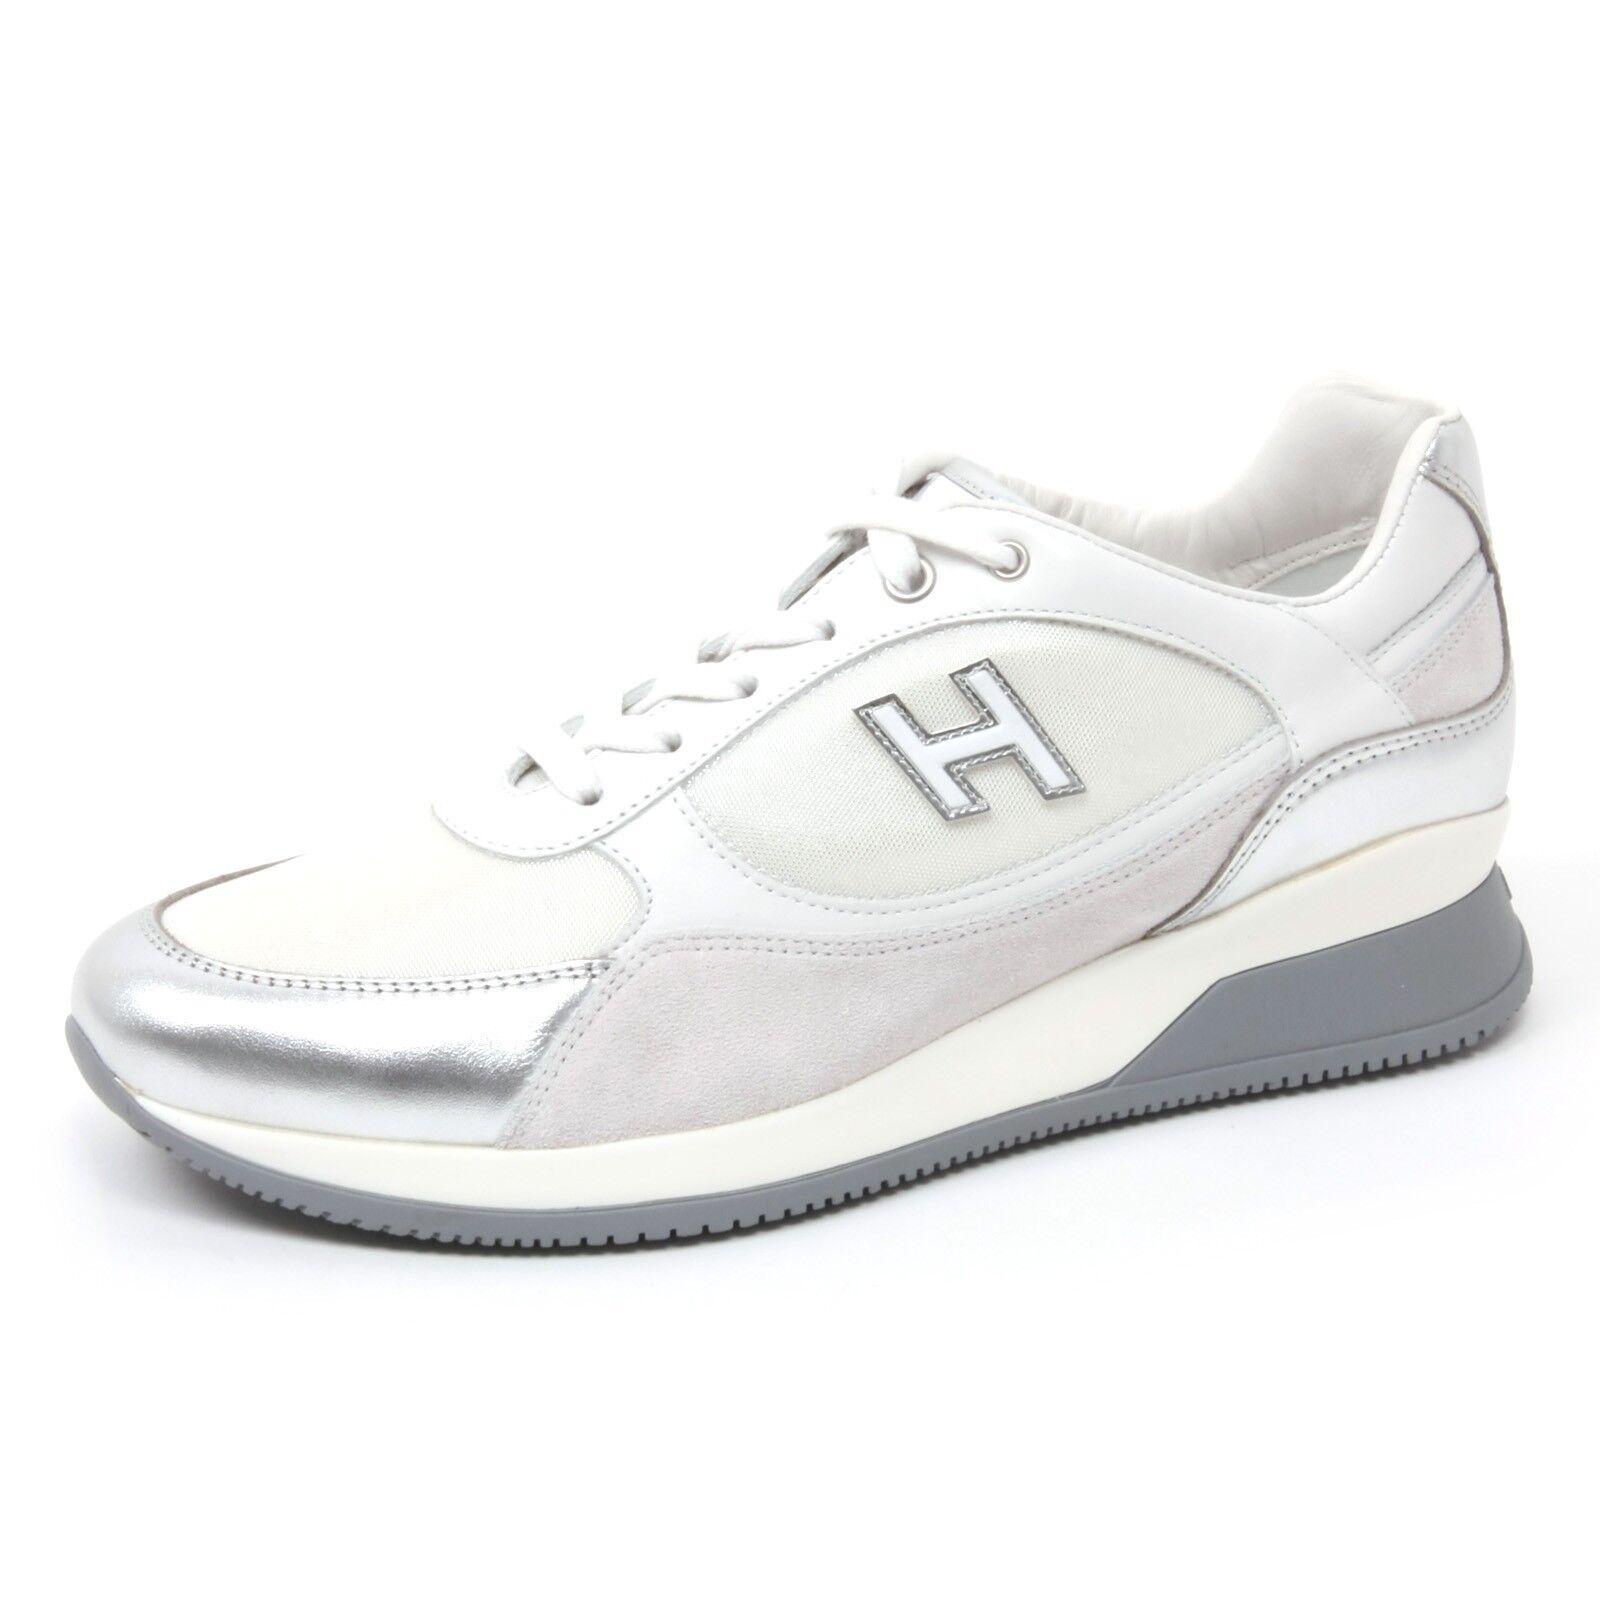 b4650 sneaker donna hogan elective tenuta in vetrina silver shoe woman